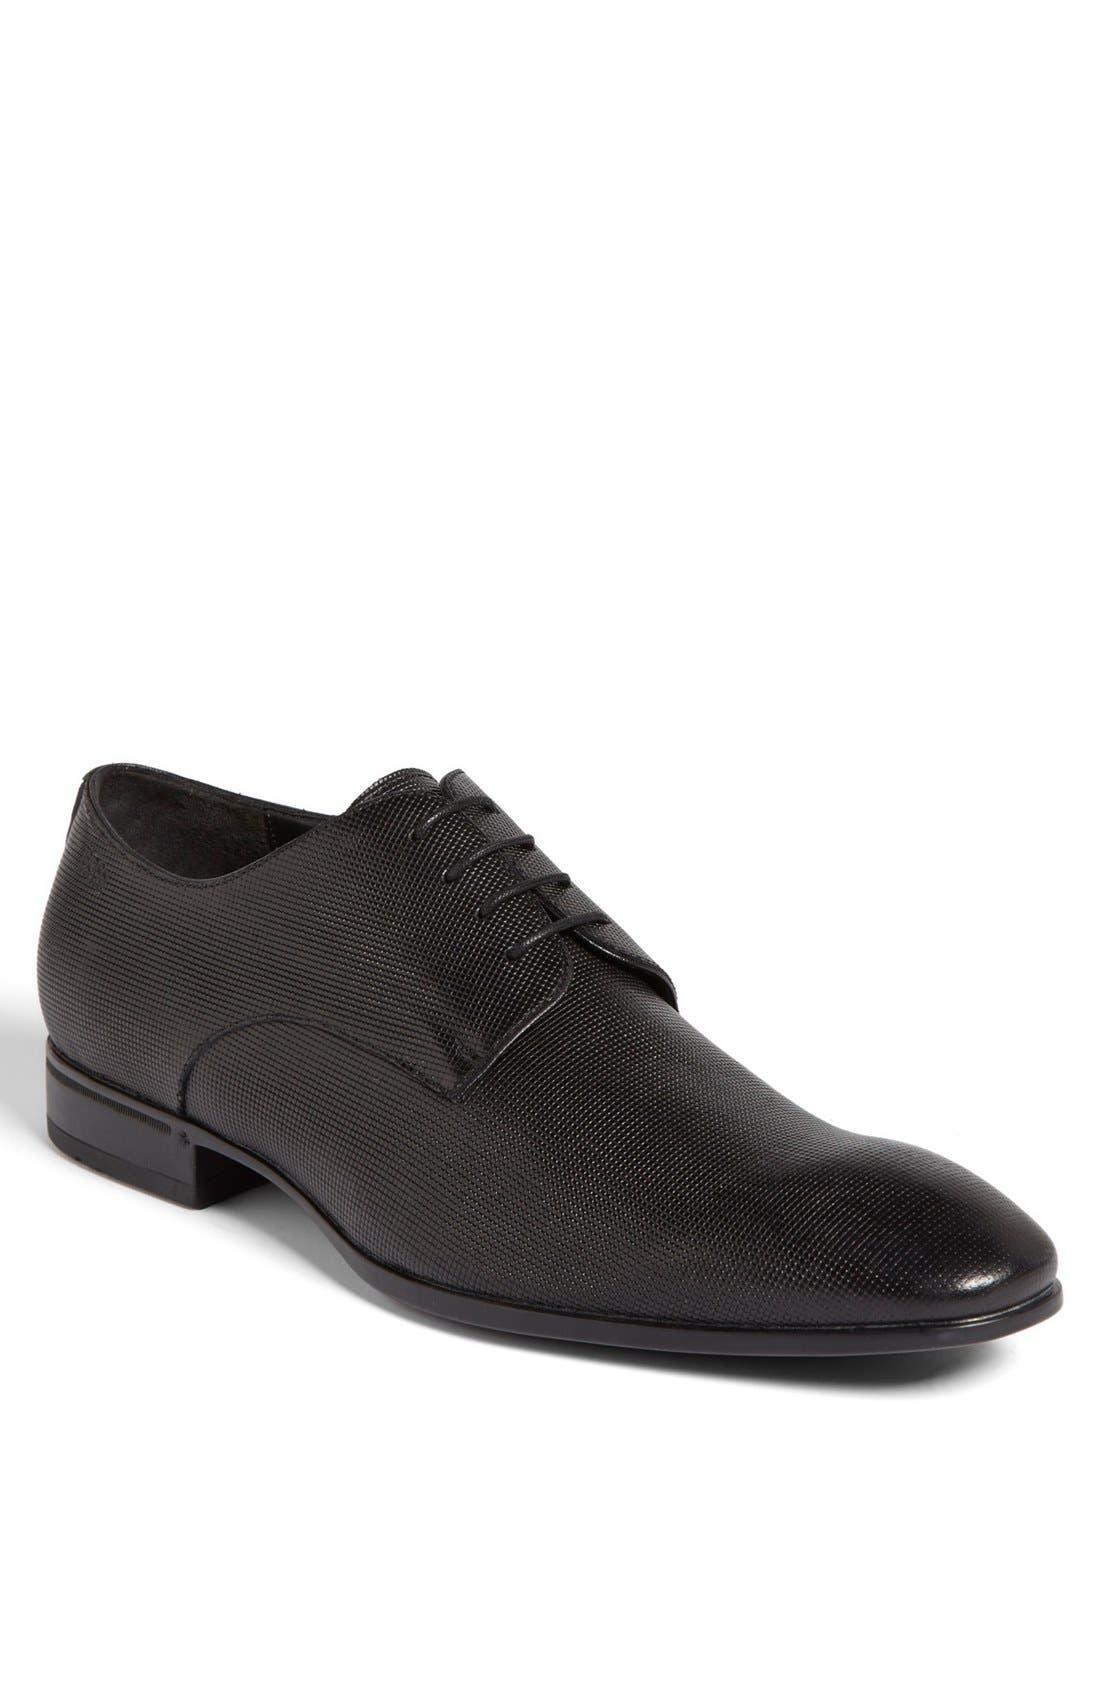 Alternate Image 1 Selected - BOSS 'Vareb' Plain Toe Oxford (Men)